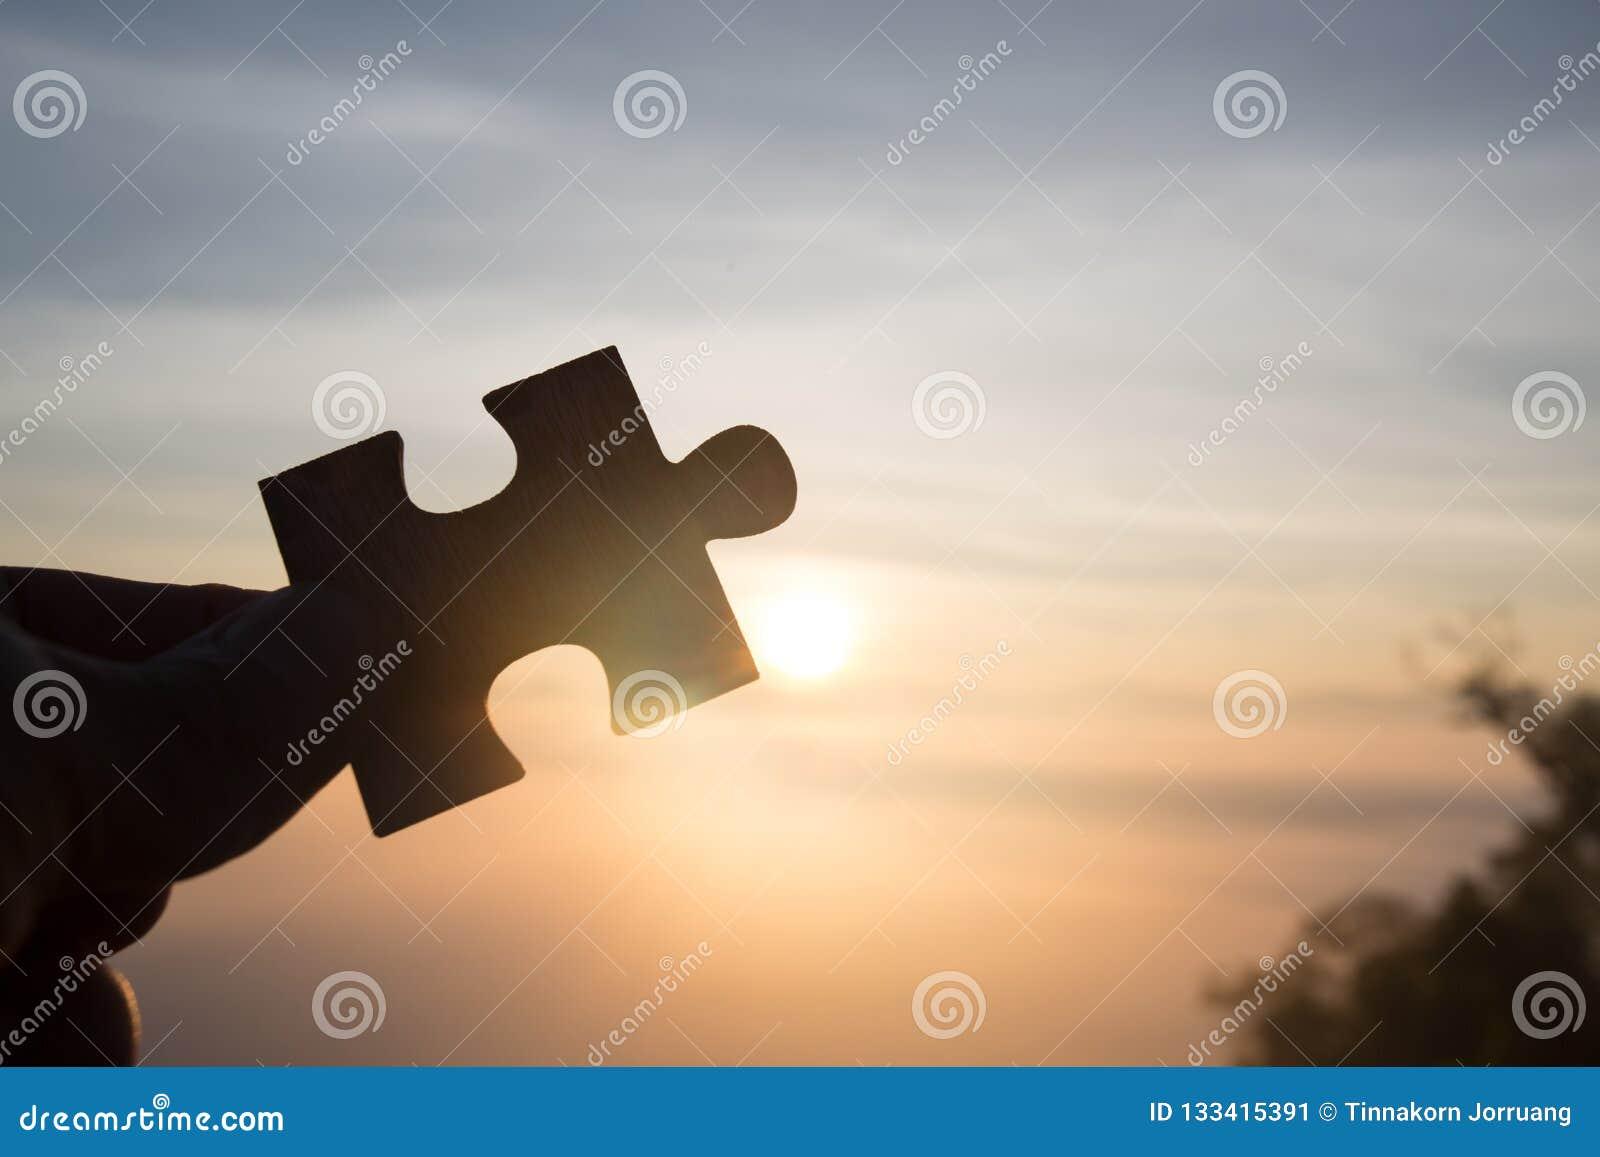 Силуэт руки держа зигзаг с предпосылкой восхода солнца Символ ассоциации и соединения Стратегия бизнеса